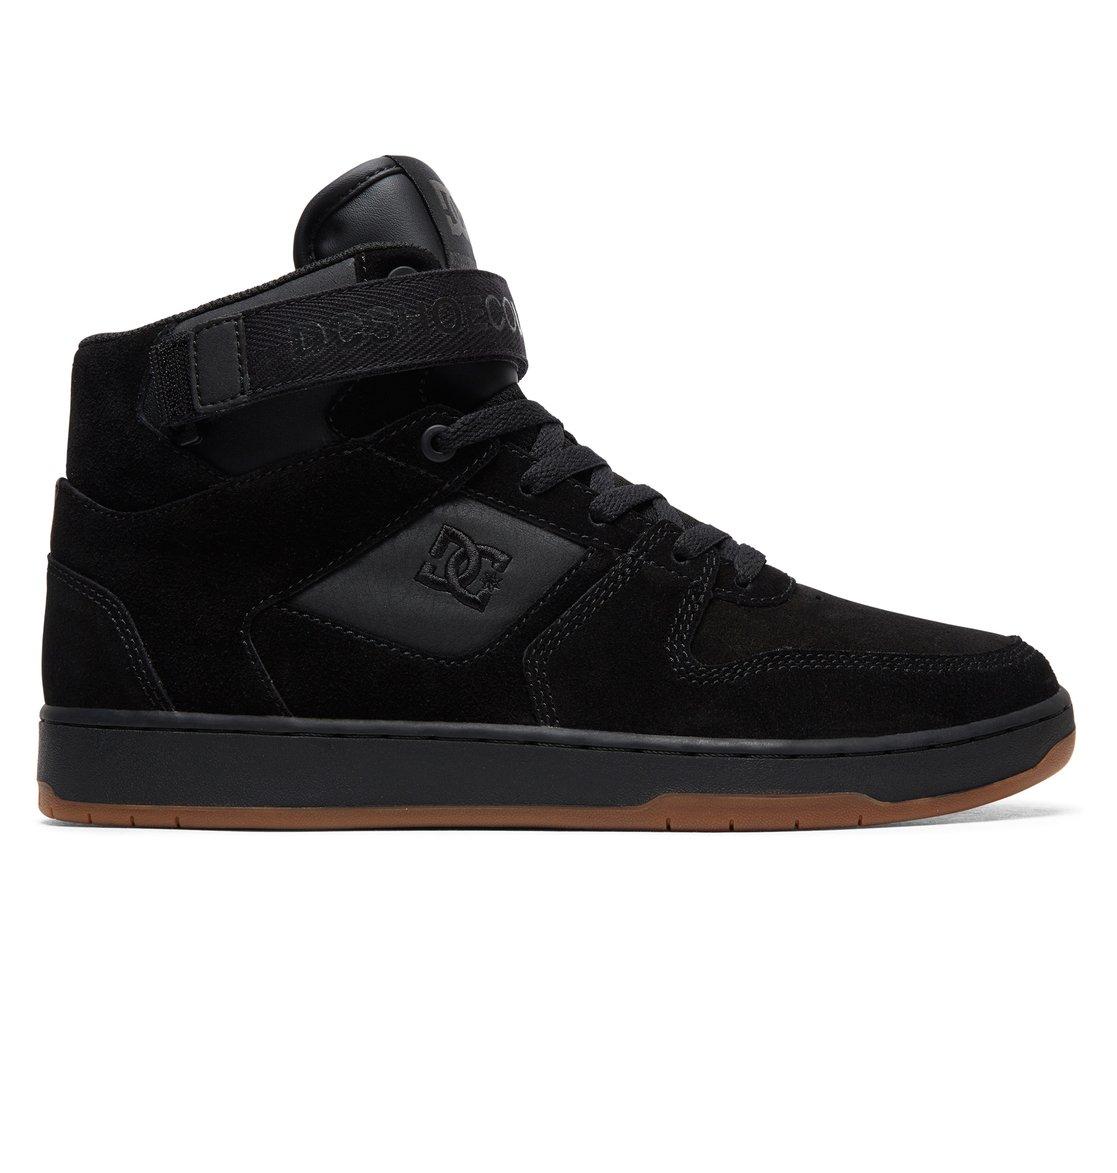 Da Shoes Scarpe Adys400054Dc S Skate Pensford Uomo jLUVpzMqSG